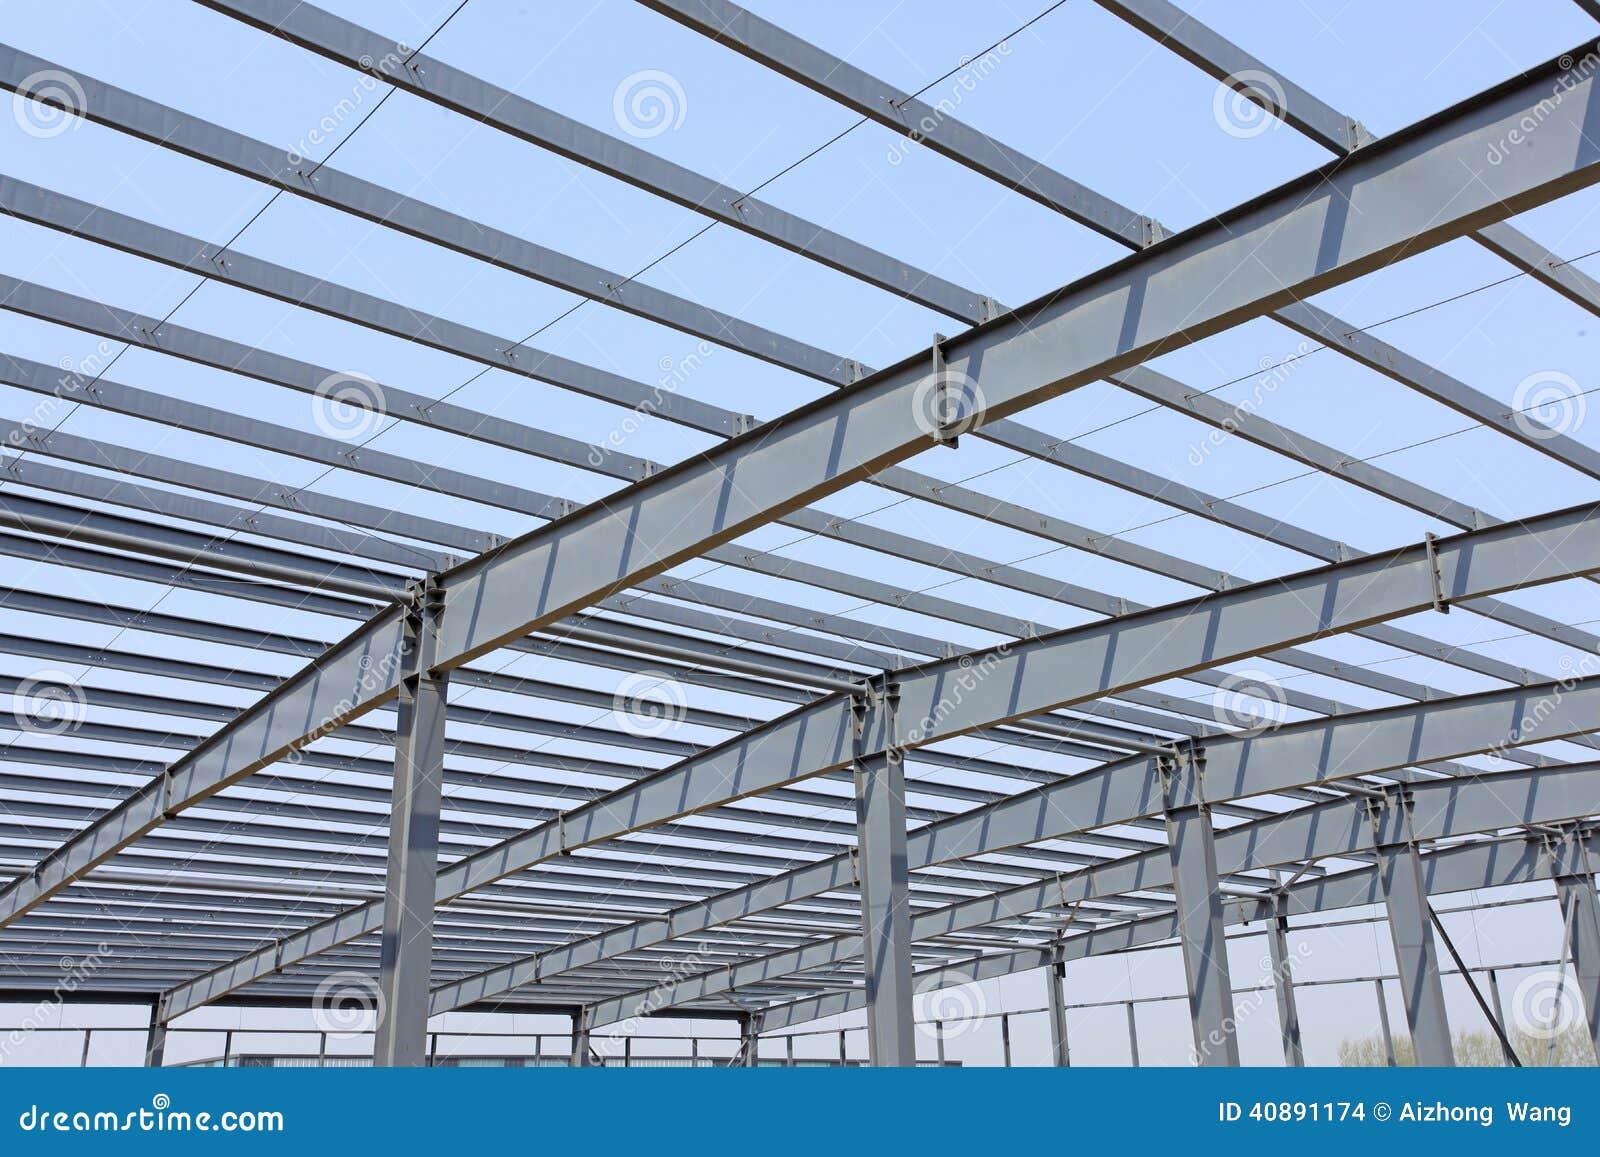 Stahlrahmenkonstruktion stockfoto. Bild von metall, stahl - 40891174